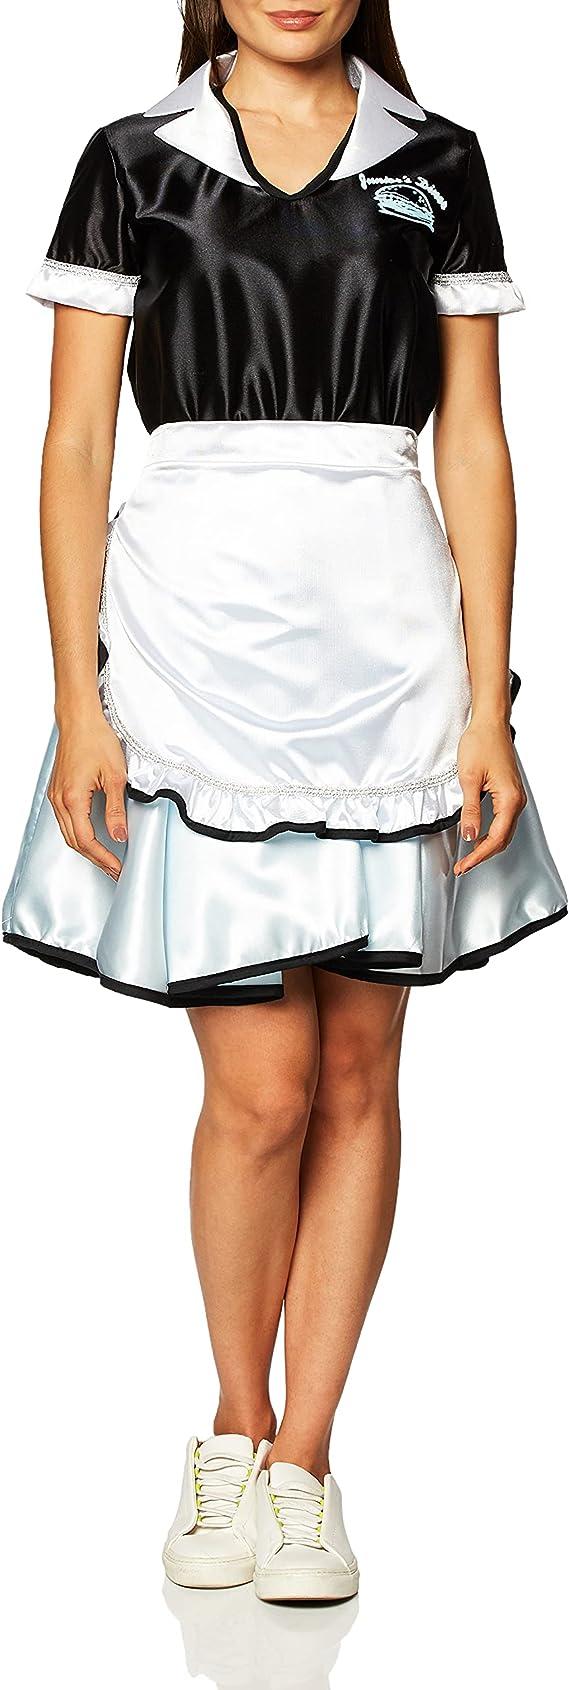 GIRLS 50/'S CAR SOCK HOP WAITRESS COSTUME DRESS S RU38720